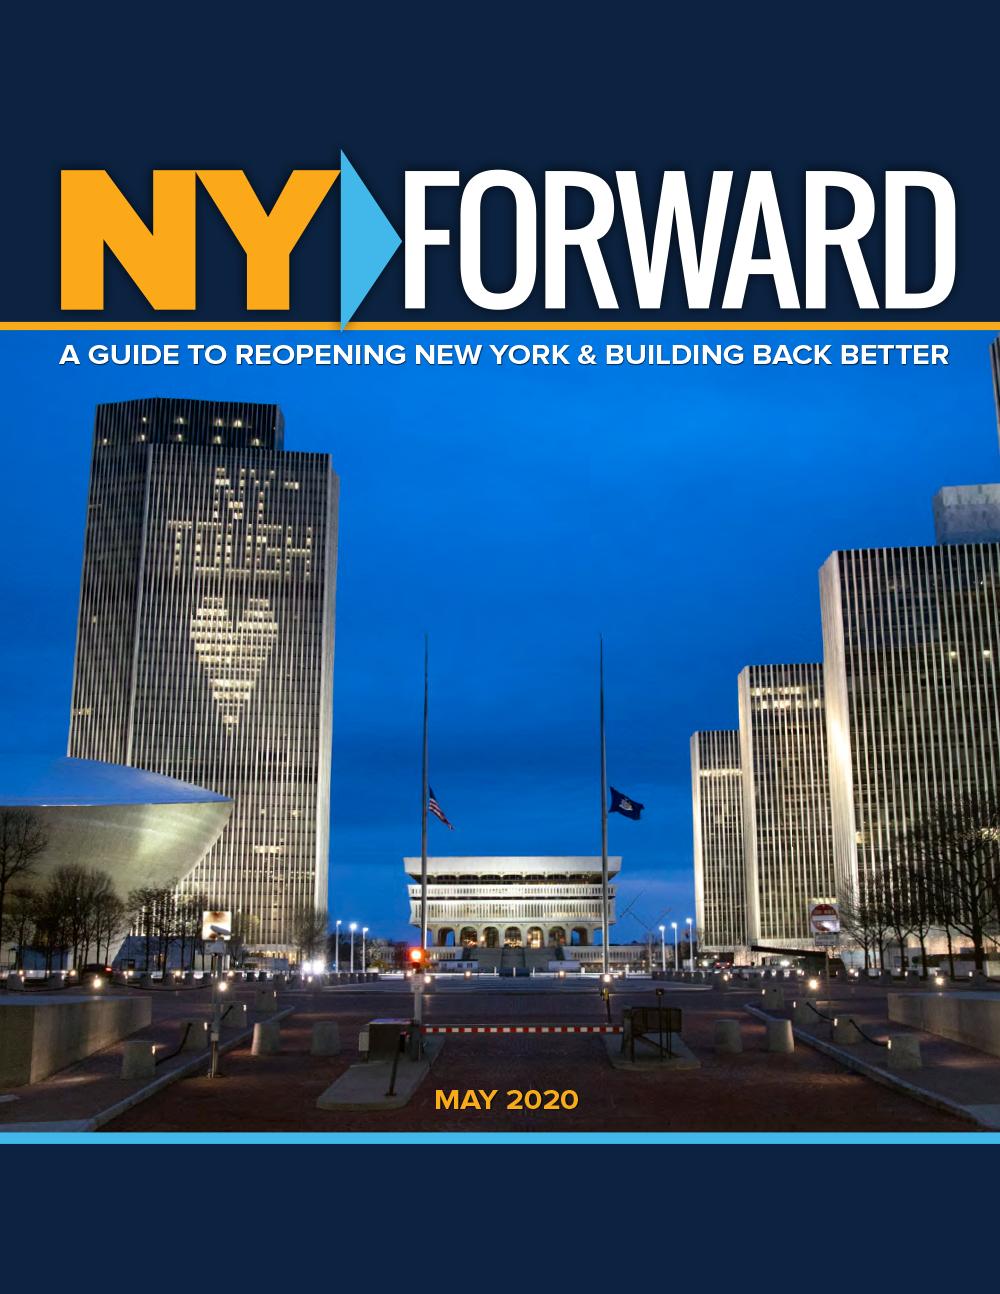 NYForwardReopeningGuide_Page_01